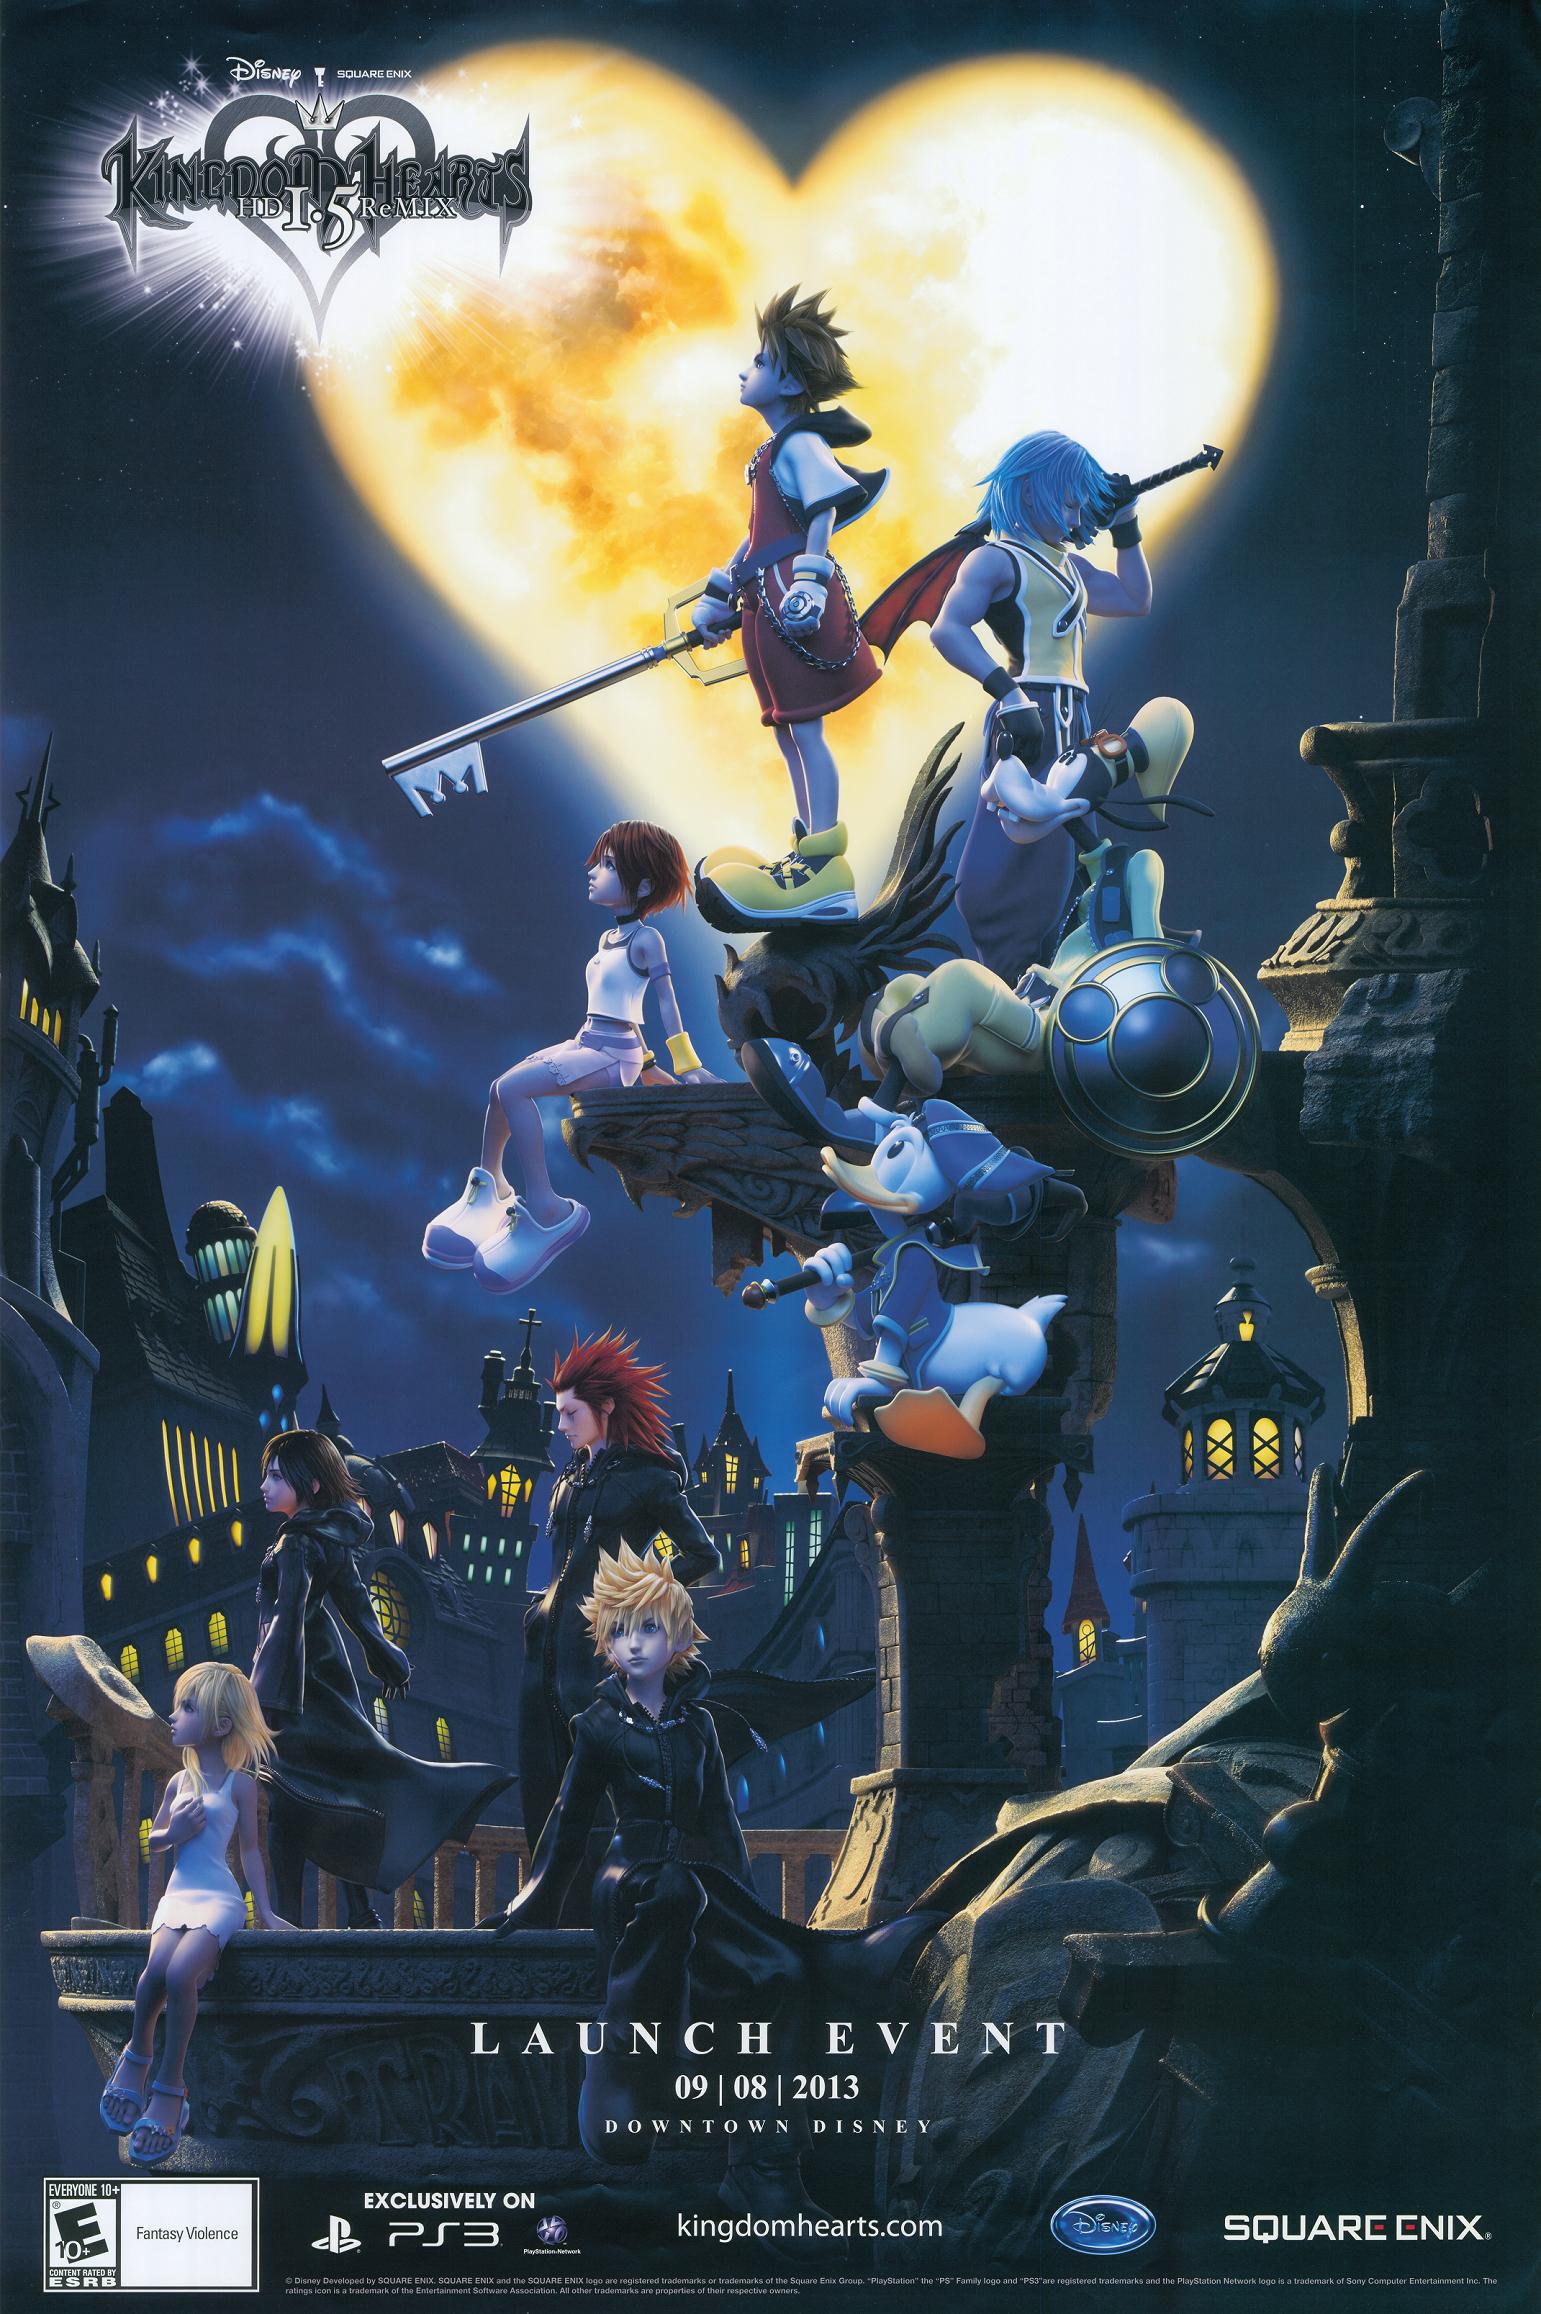 Poster promotional Sora, Riku, Kairi, Donal, Goofy, Namine